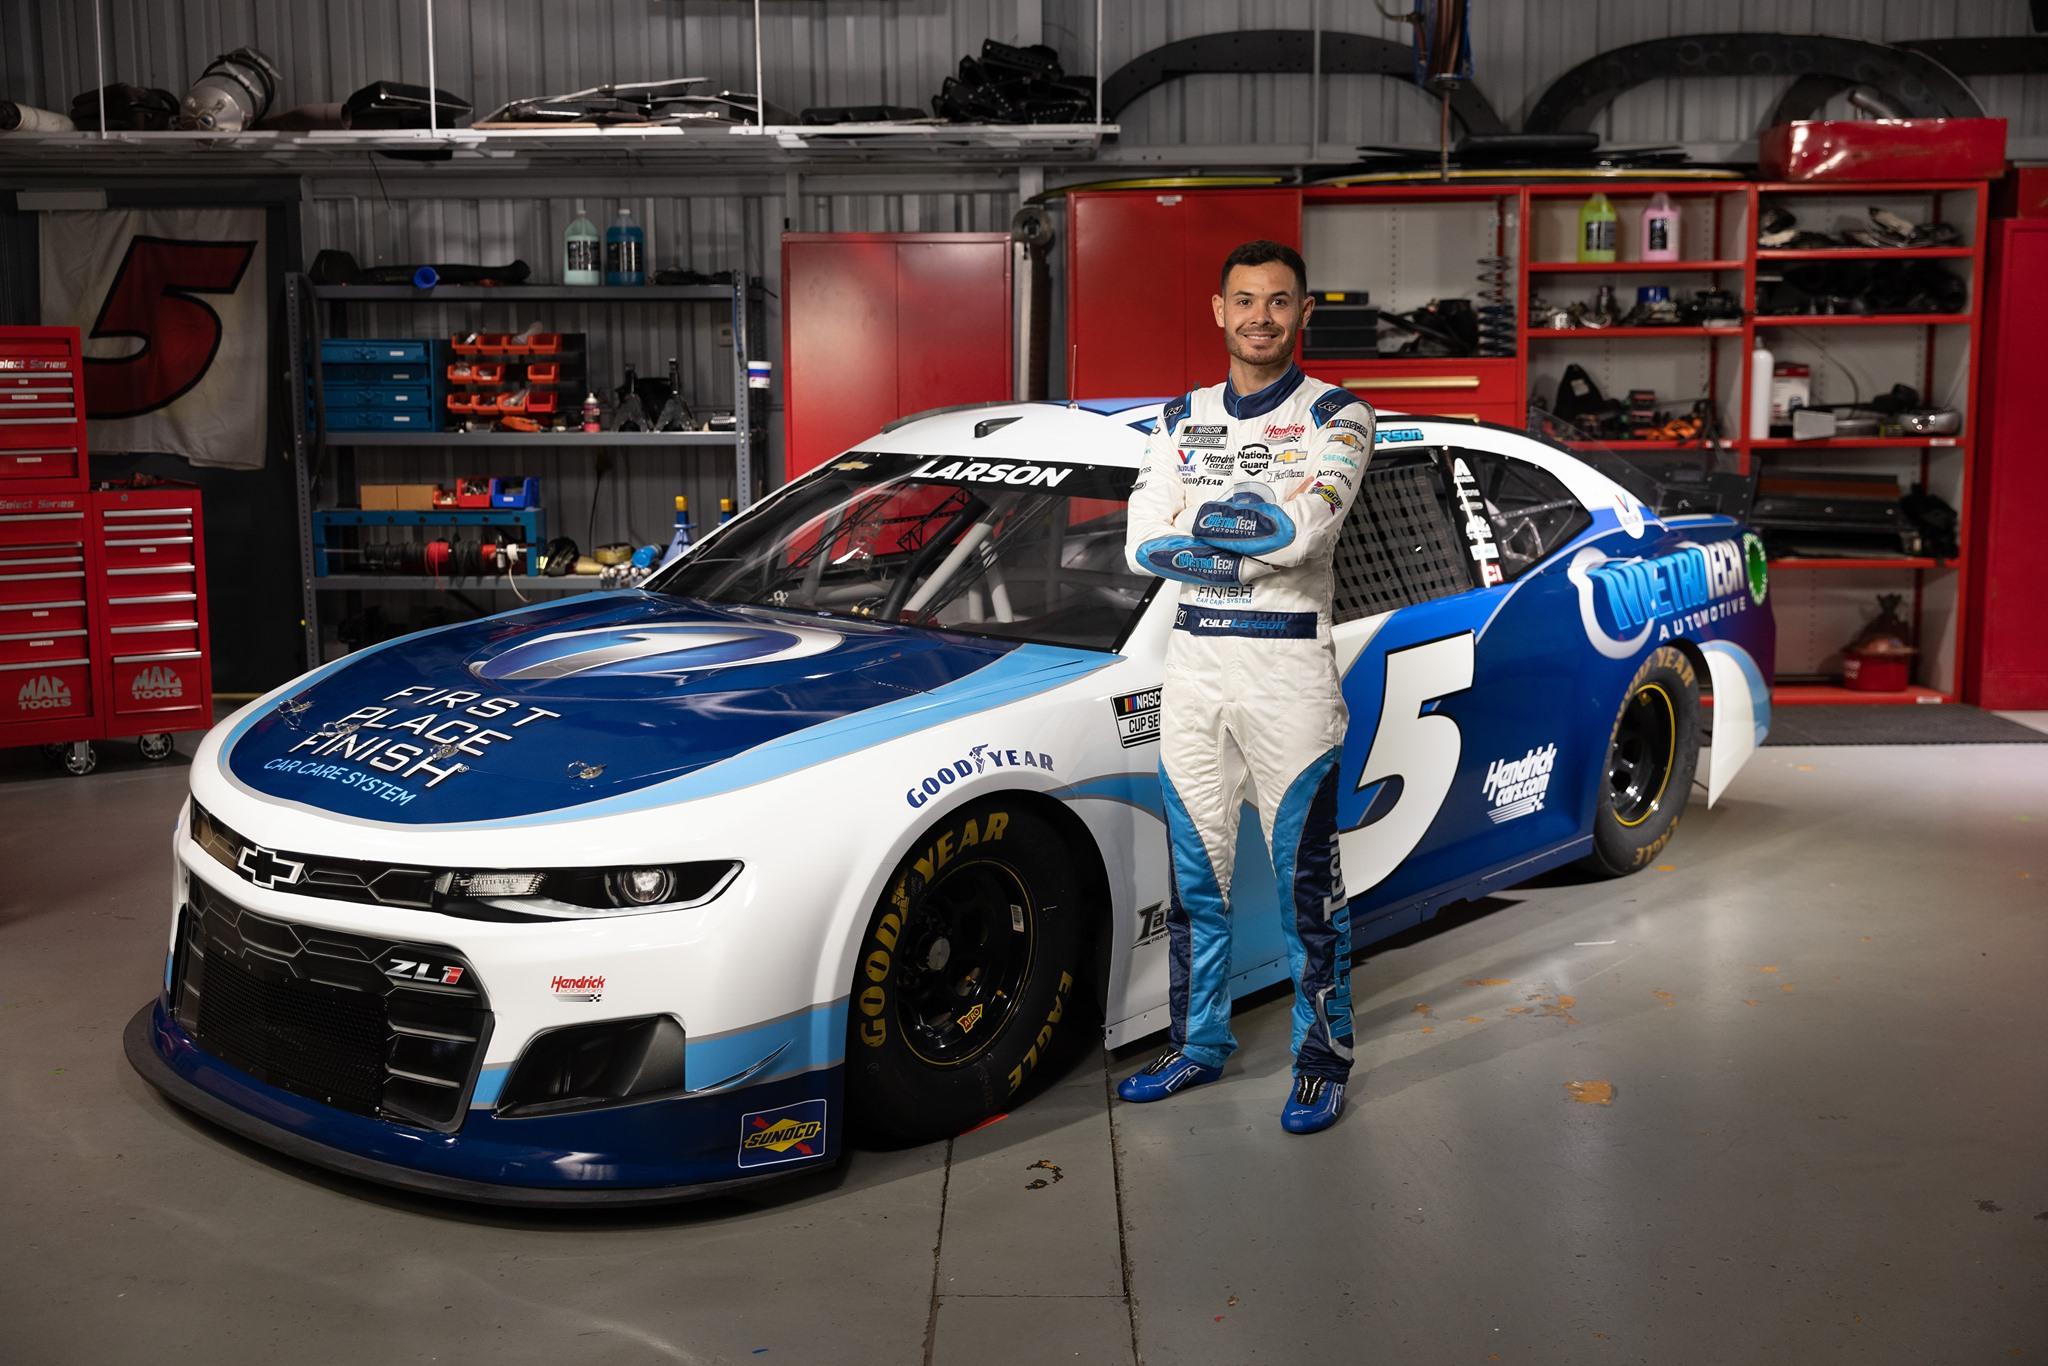 MetroTech Auto - Hendrick Motorsports 5 - Kyle Larson - NASCAR Cup Series